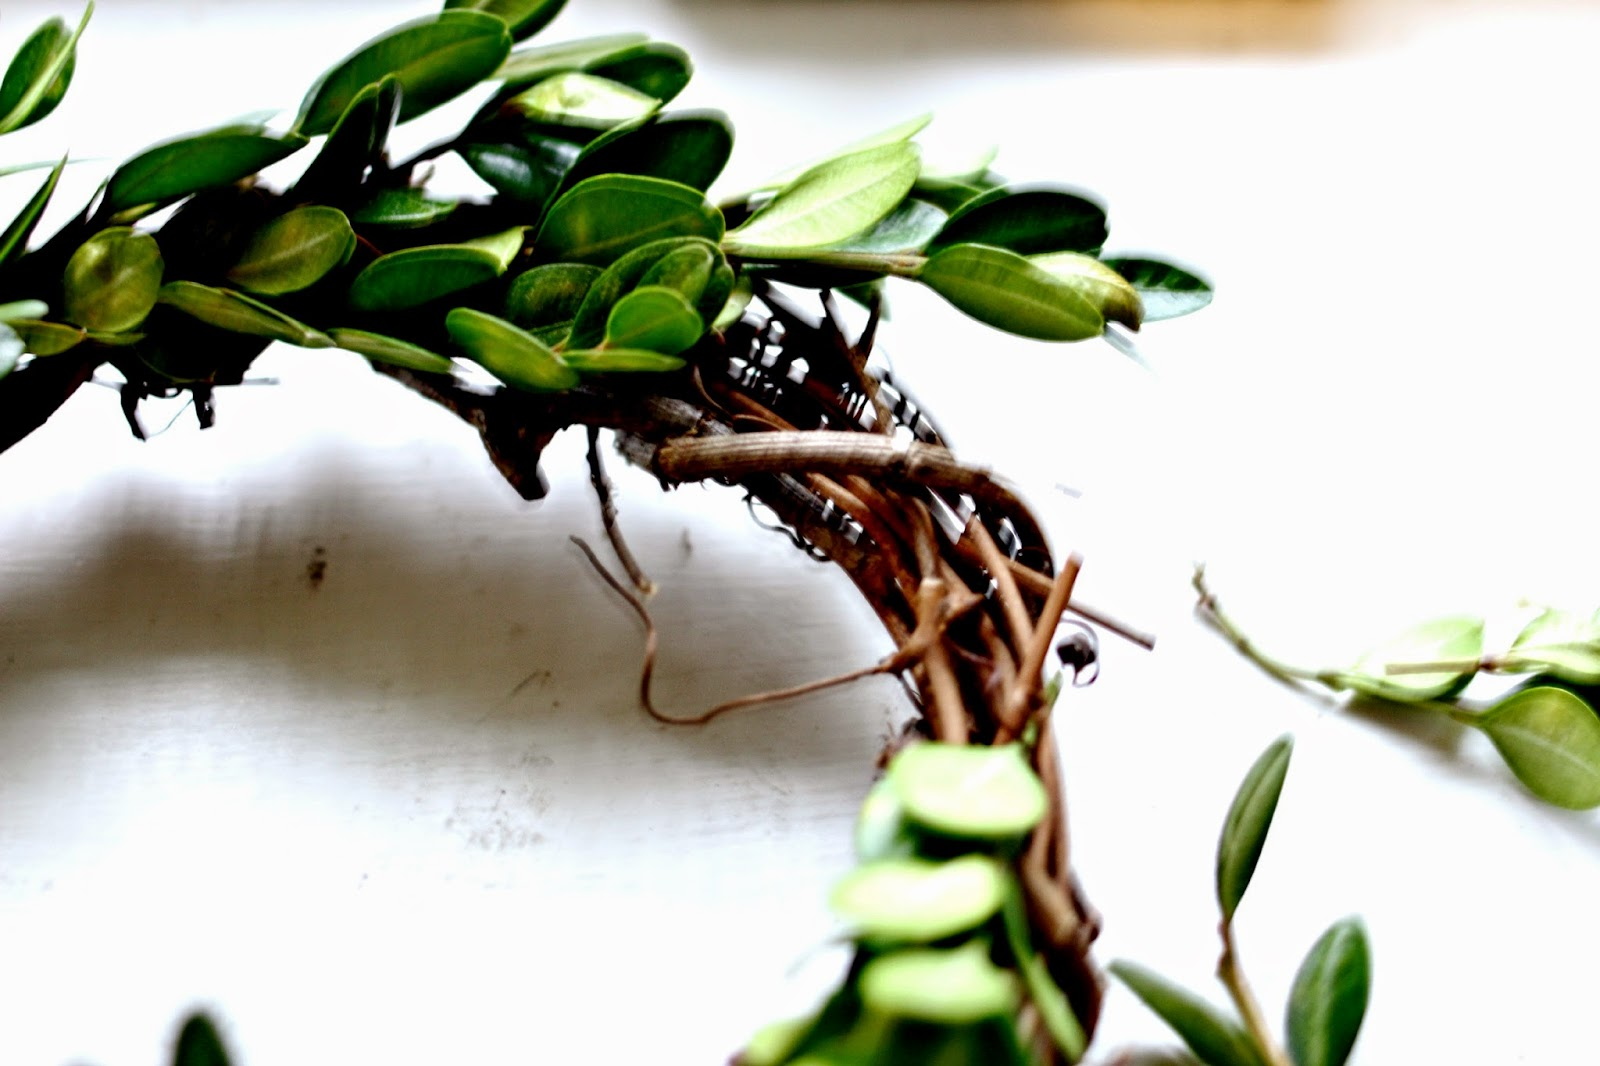 DIY boxwood wreath tutorial using grapevine wreath-www.goldenboysandme.com